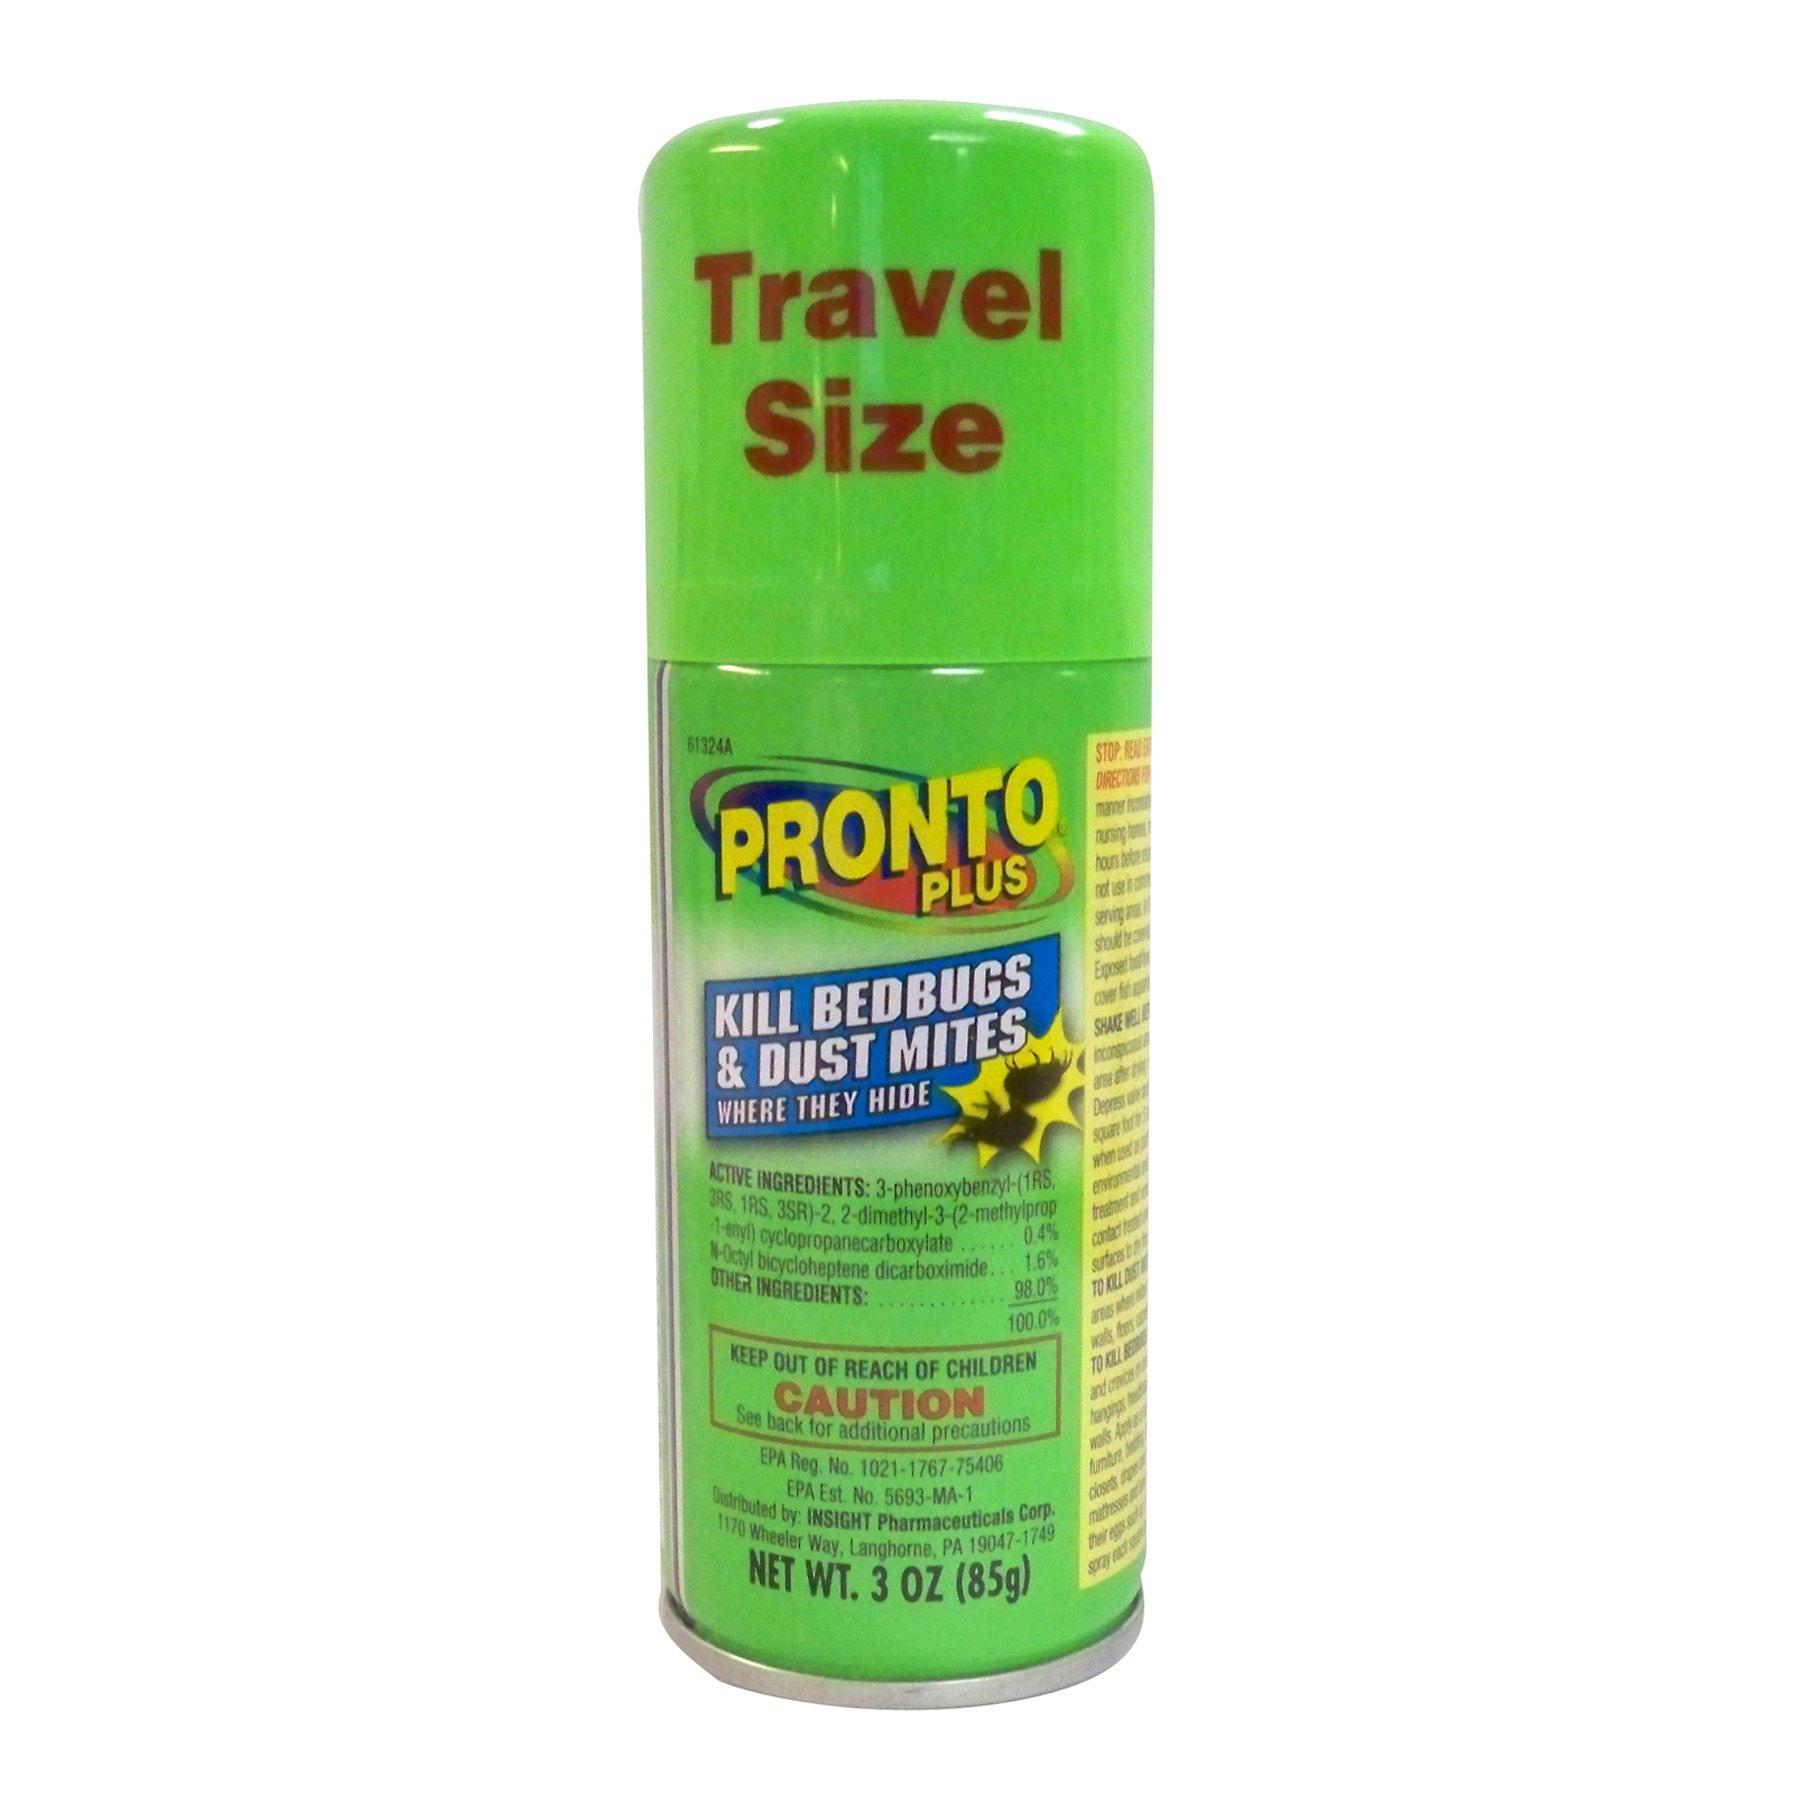 Pronto Bedbug & Dust Mite Spray, 4 Count